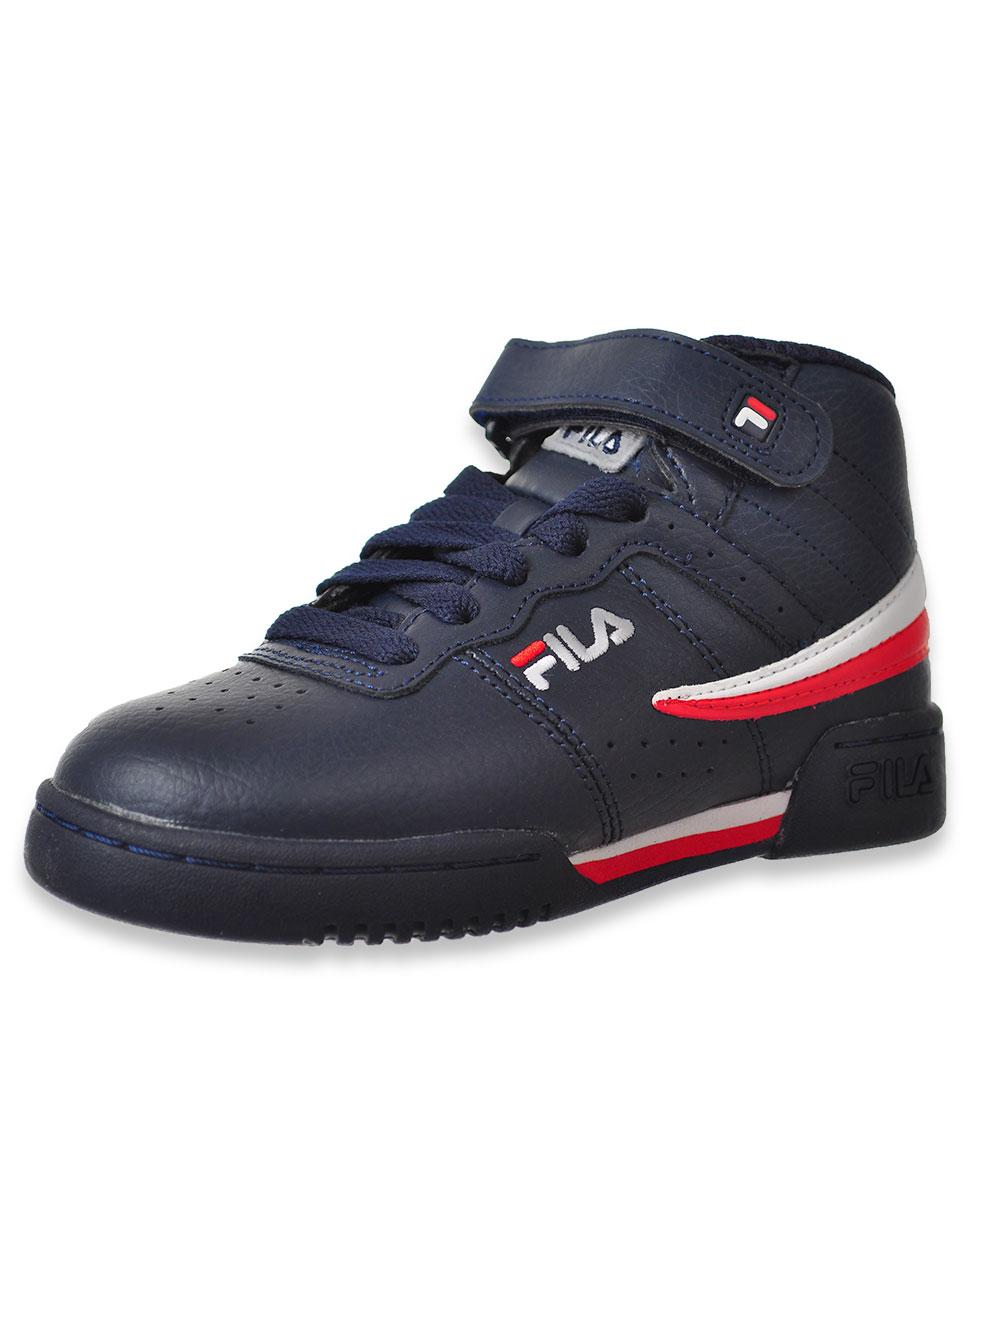 Fila Boys' F 13 Hi Top Sneakers (Sizes 11 – 7)